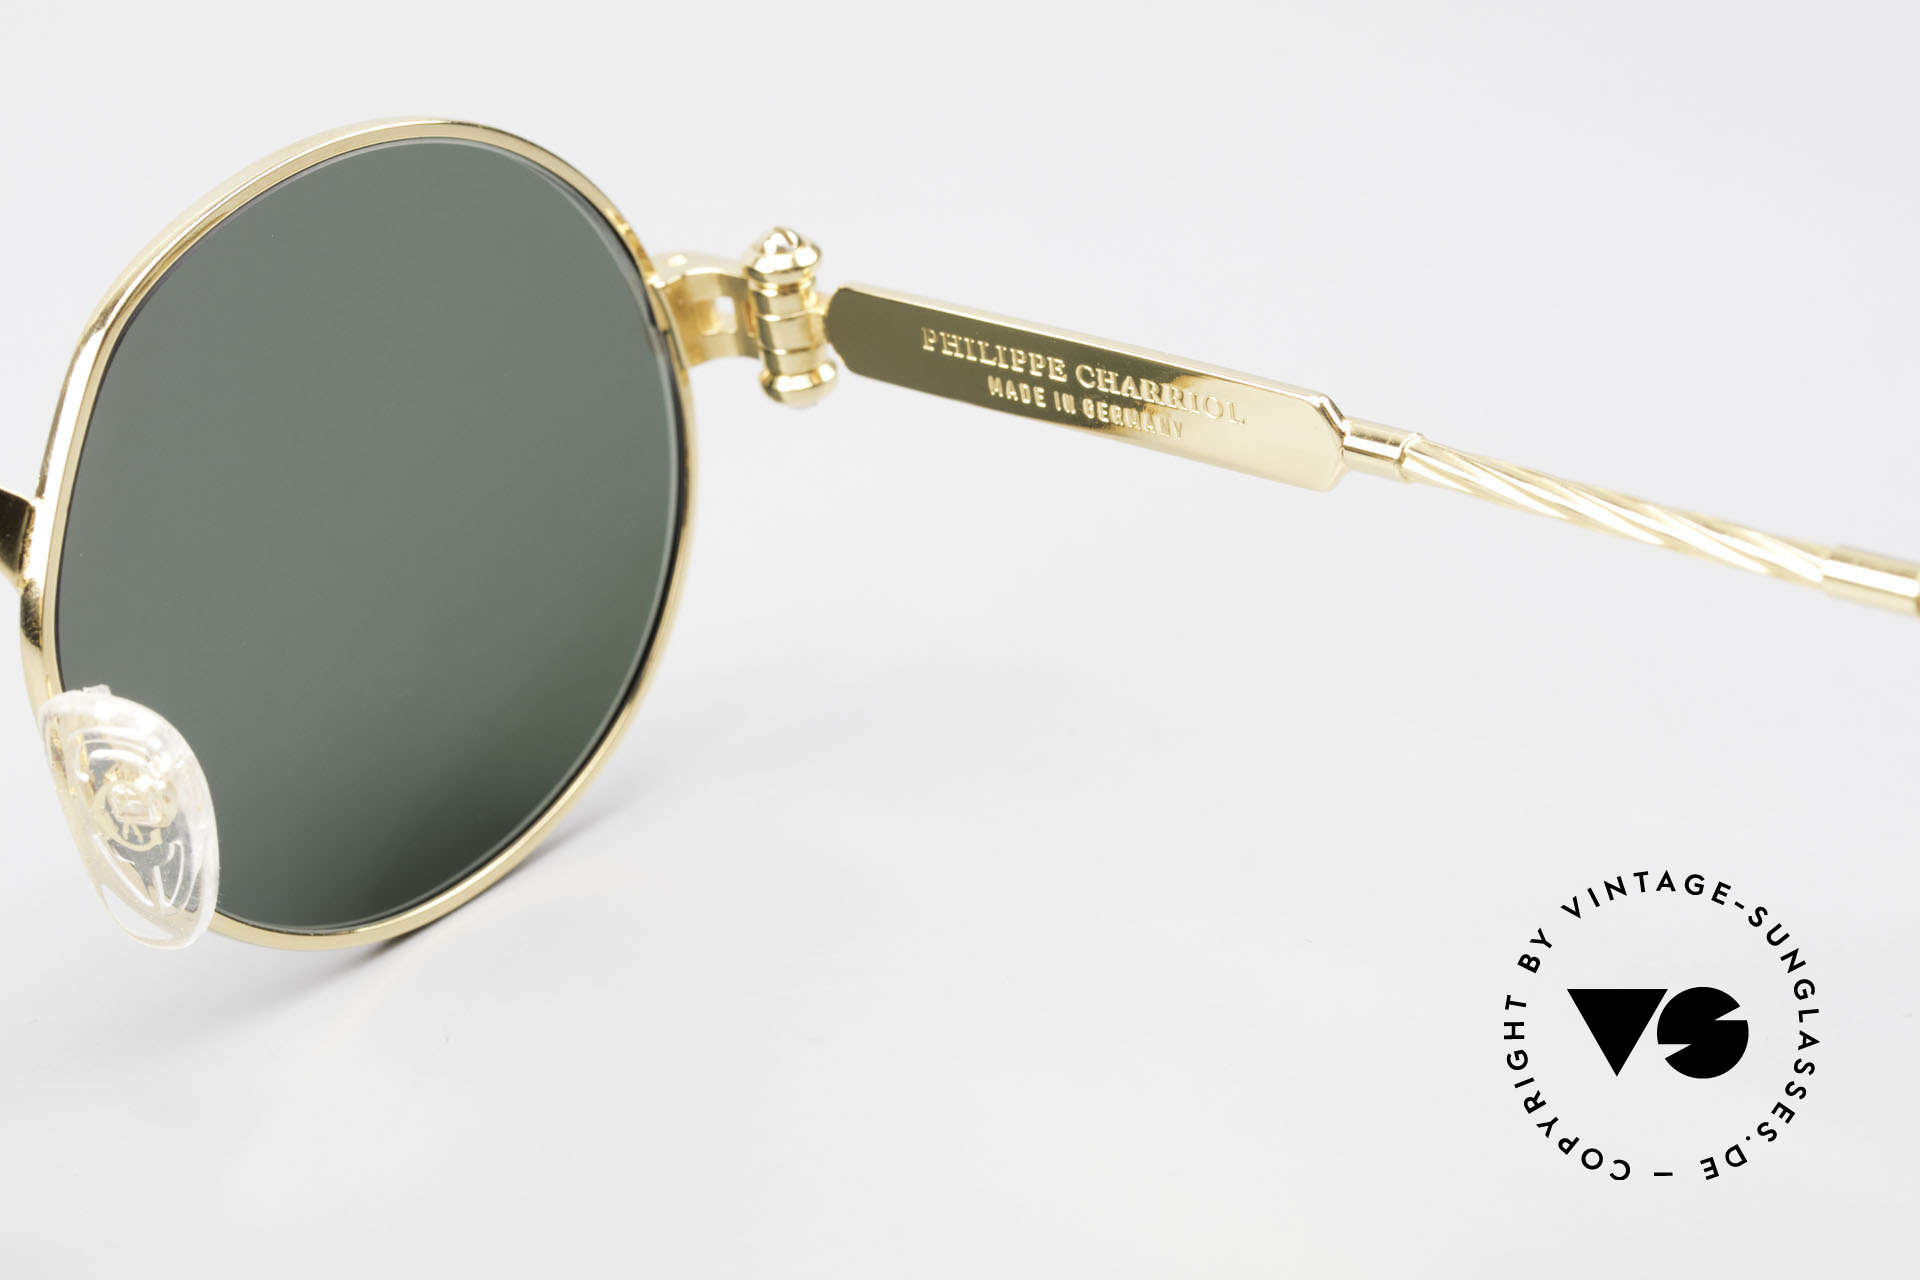 Philippe Charriol 92CPT Insider Luxury Sunglasses 80's, Size: medium, Made for Men